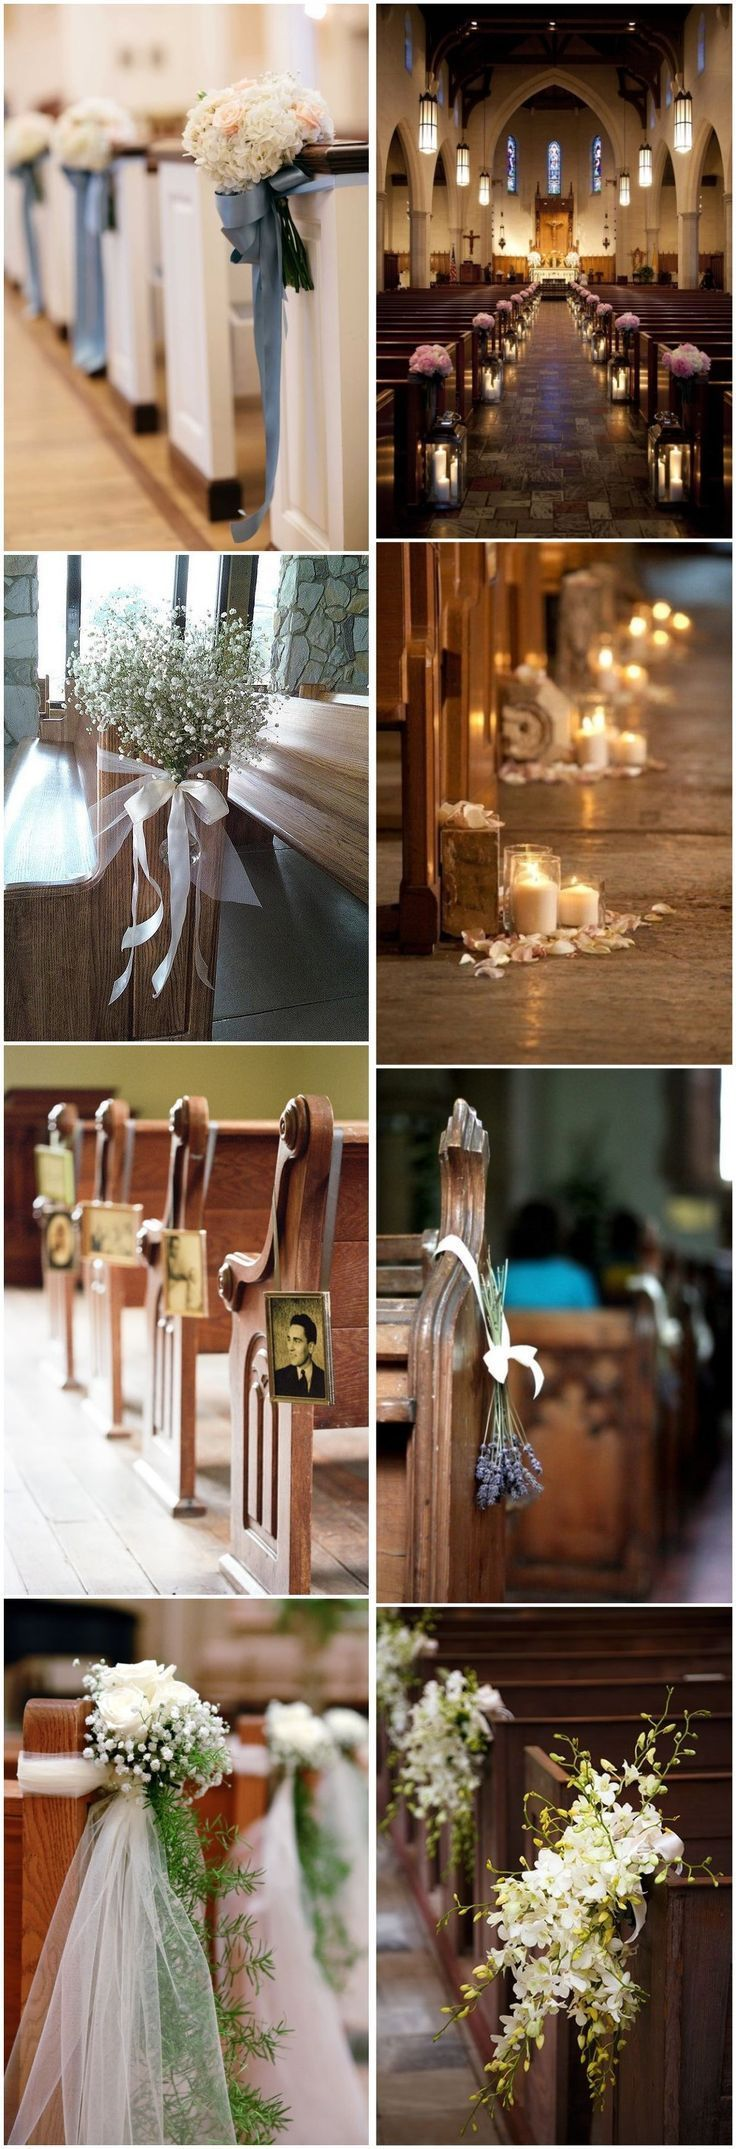 Wedding decorations 21 stunning church wedding aisle decoration wedding decorations 21 stunning church wedding aisle decoration ideas to steal see junglespirit Gallery